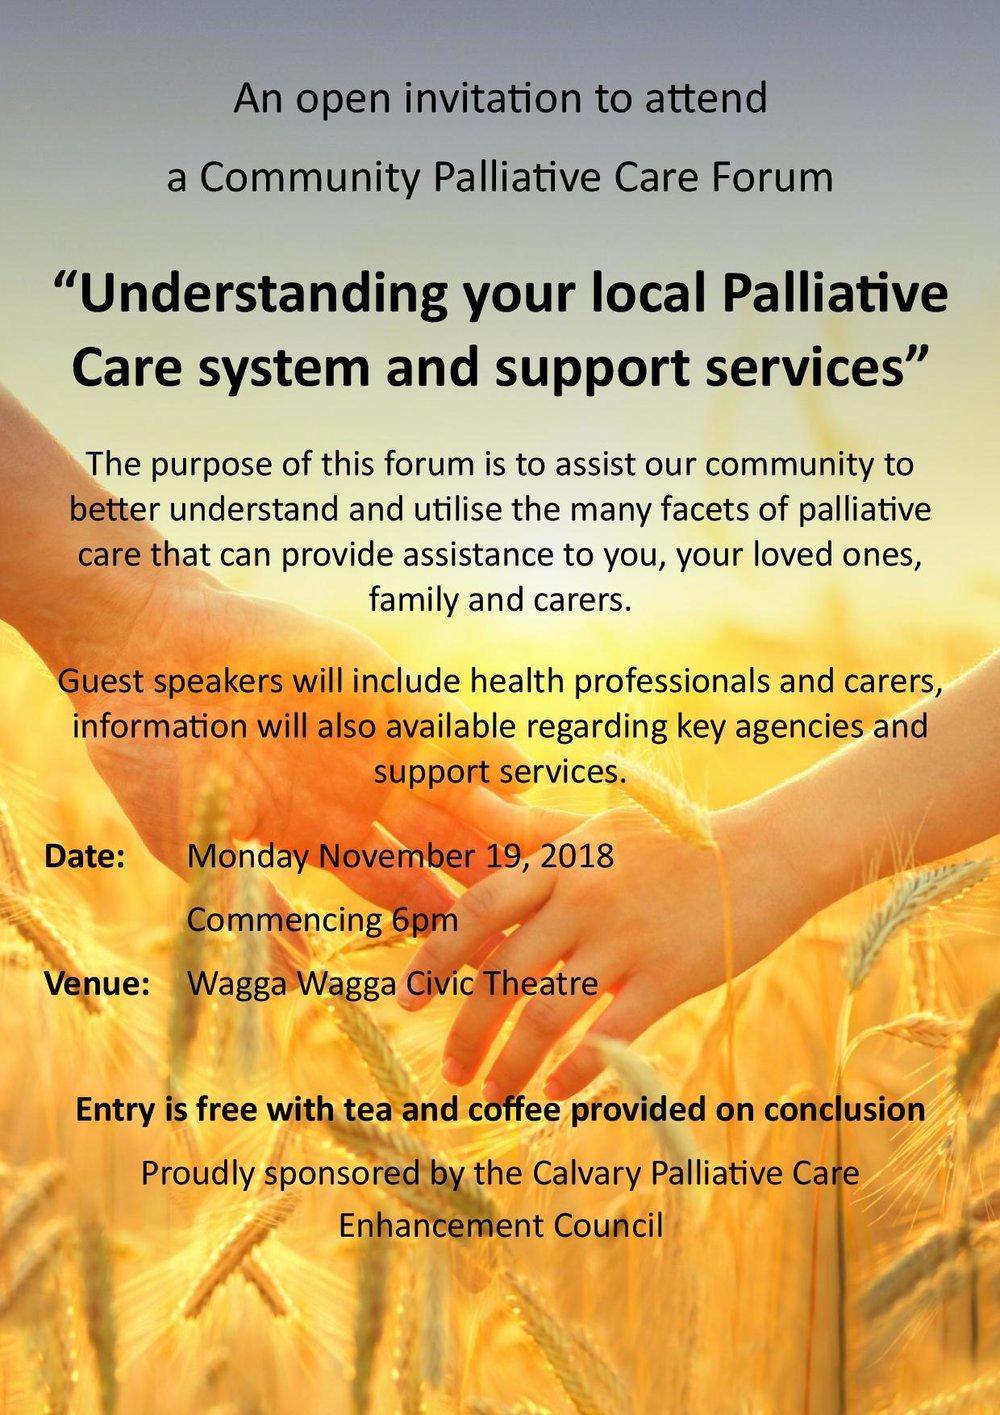 Palliative Care Forum Flyer 2018.jpg